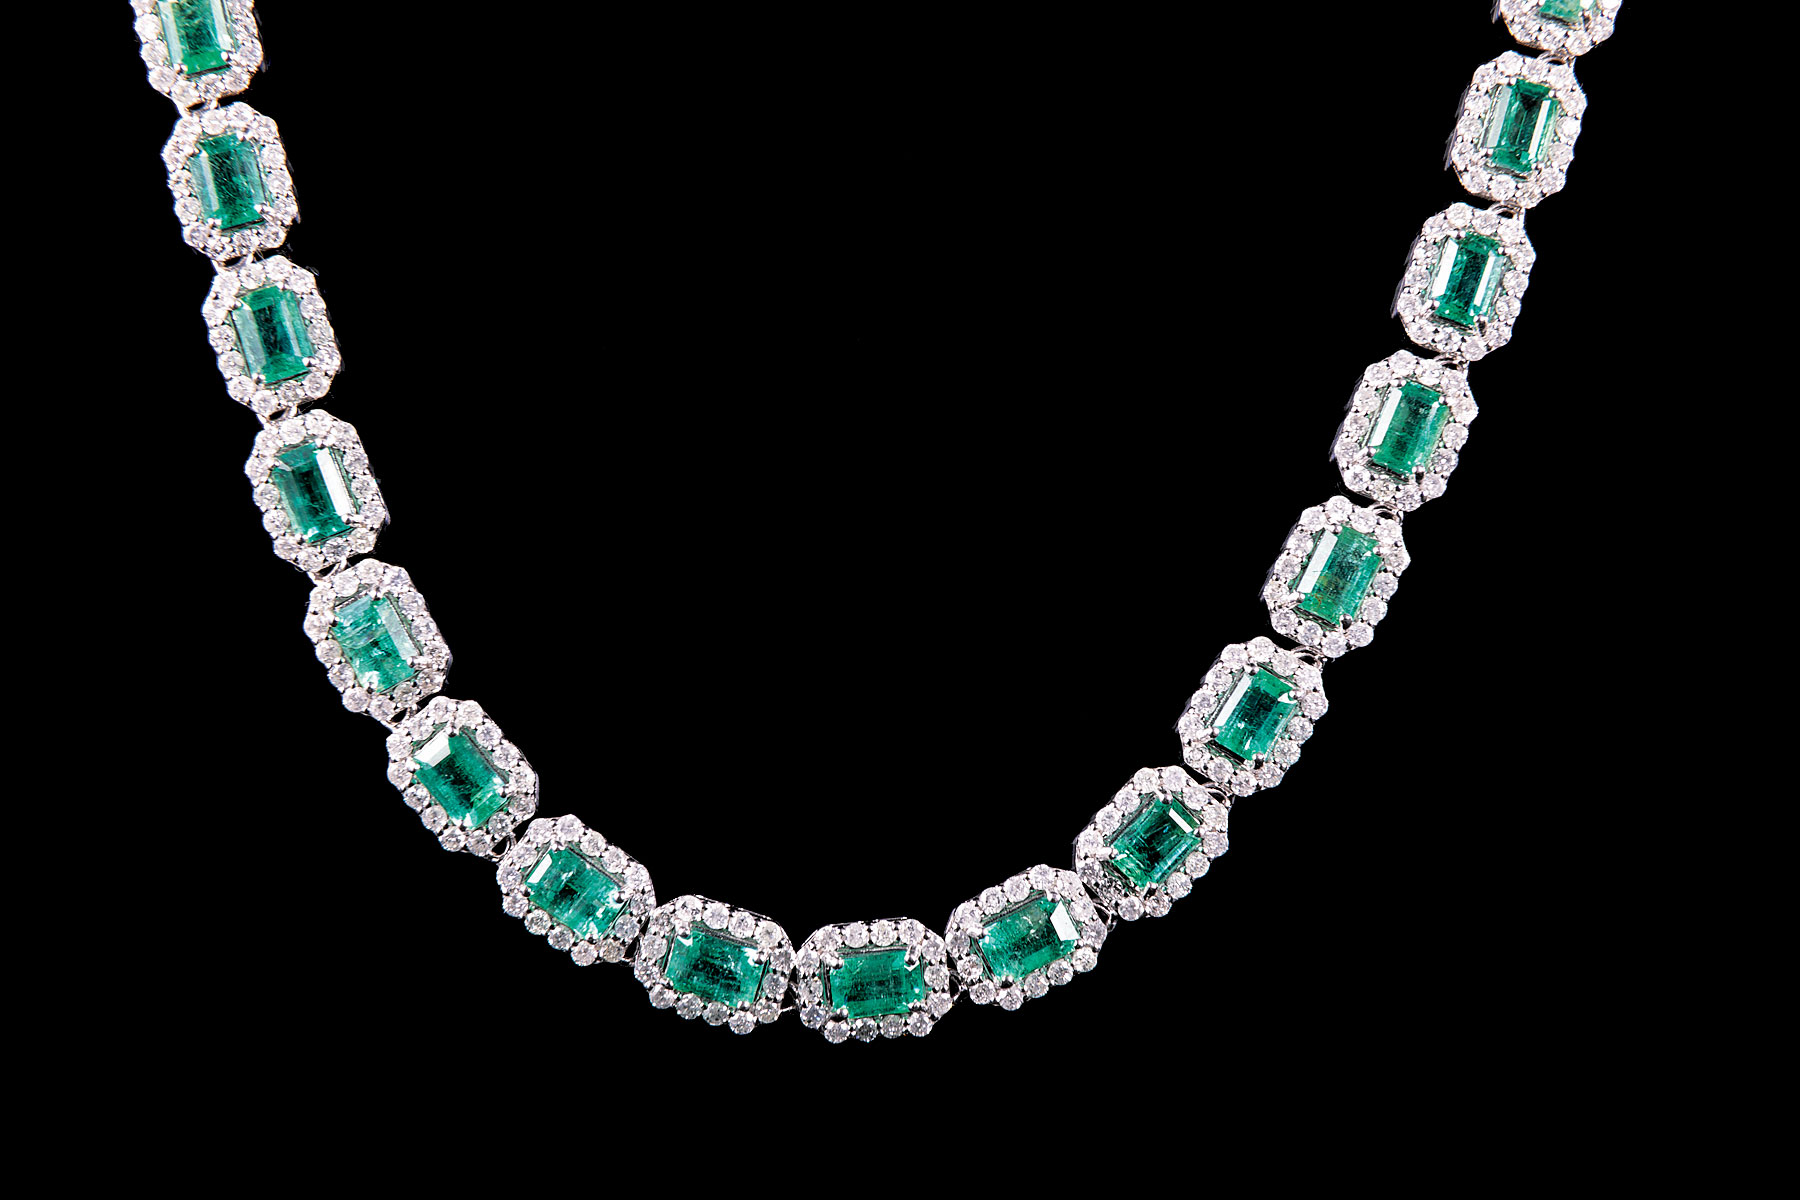 Lot 579 - 14 kt. White Gold, Emerald and Diamond Necklace , 41 prong set rectangular step cut natural